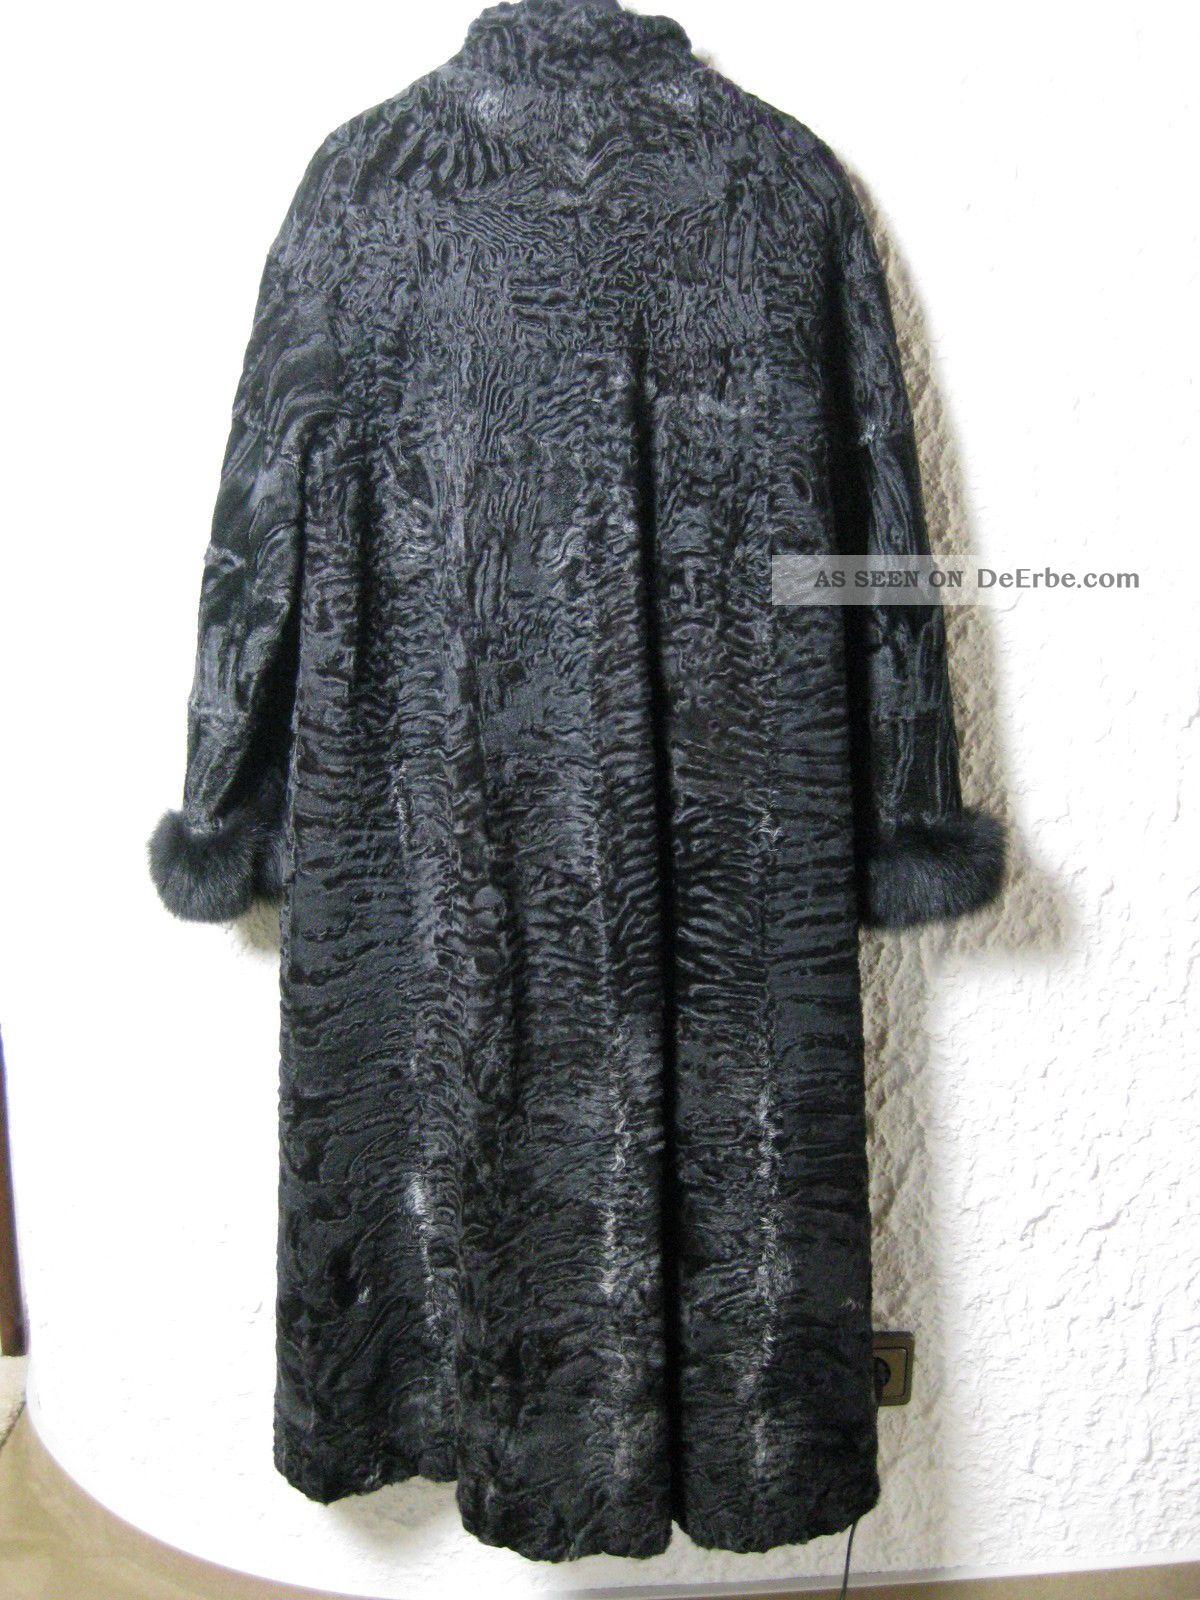 Swakara persianer mantel